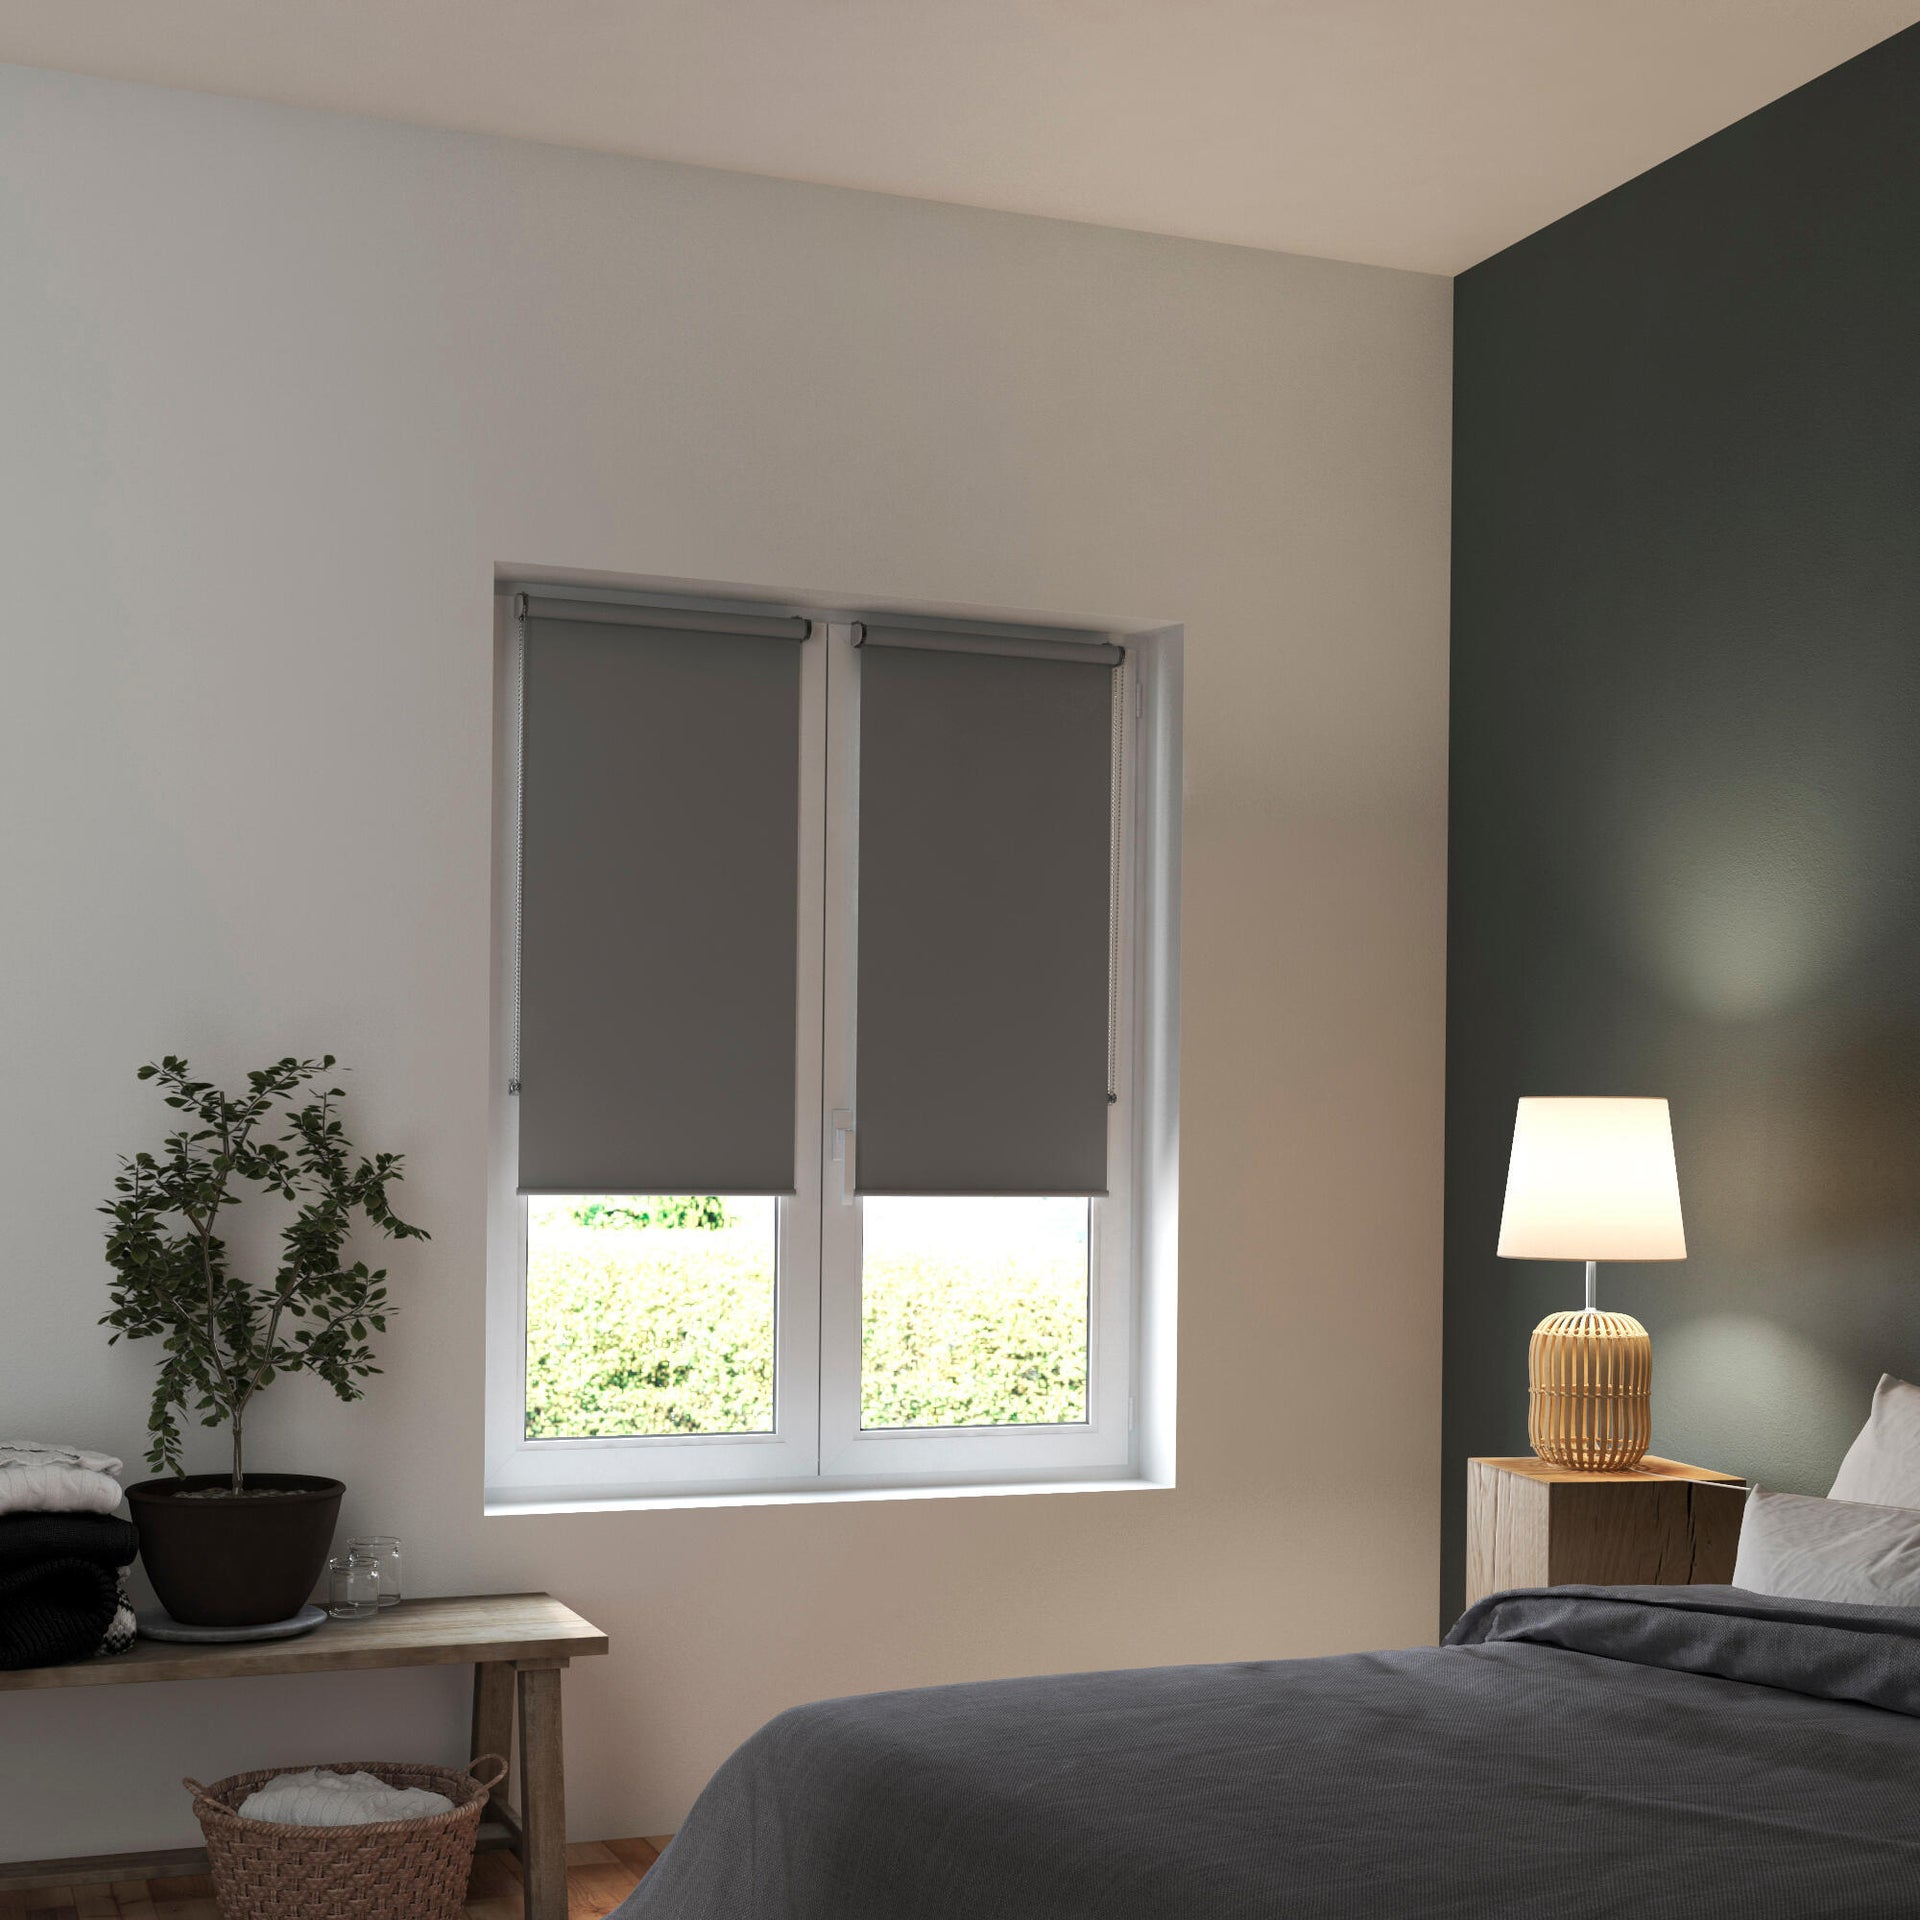 Tenda a rullo oscurante INSPIRE Tokyo grigio 55 x 160 cm - 6